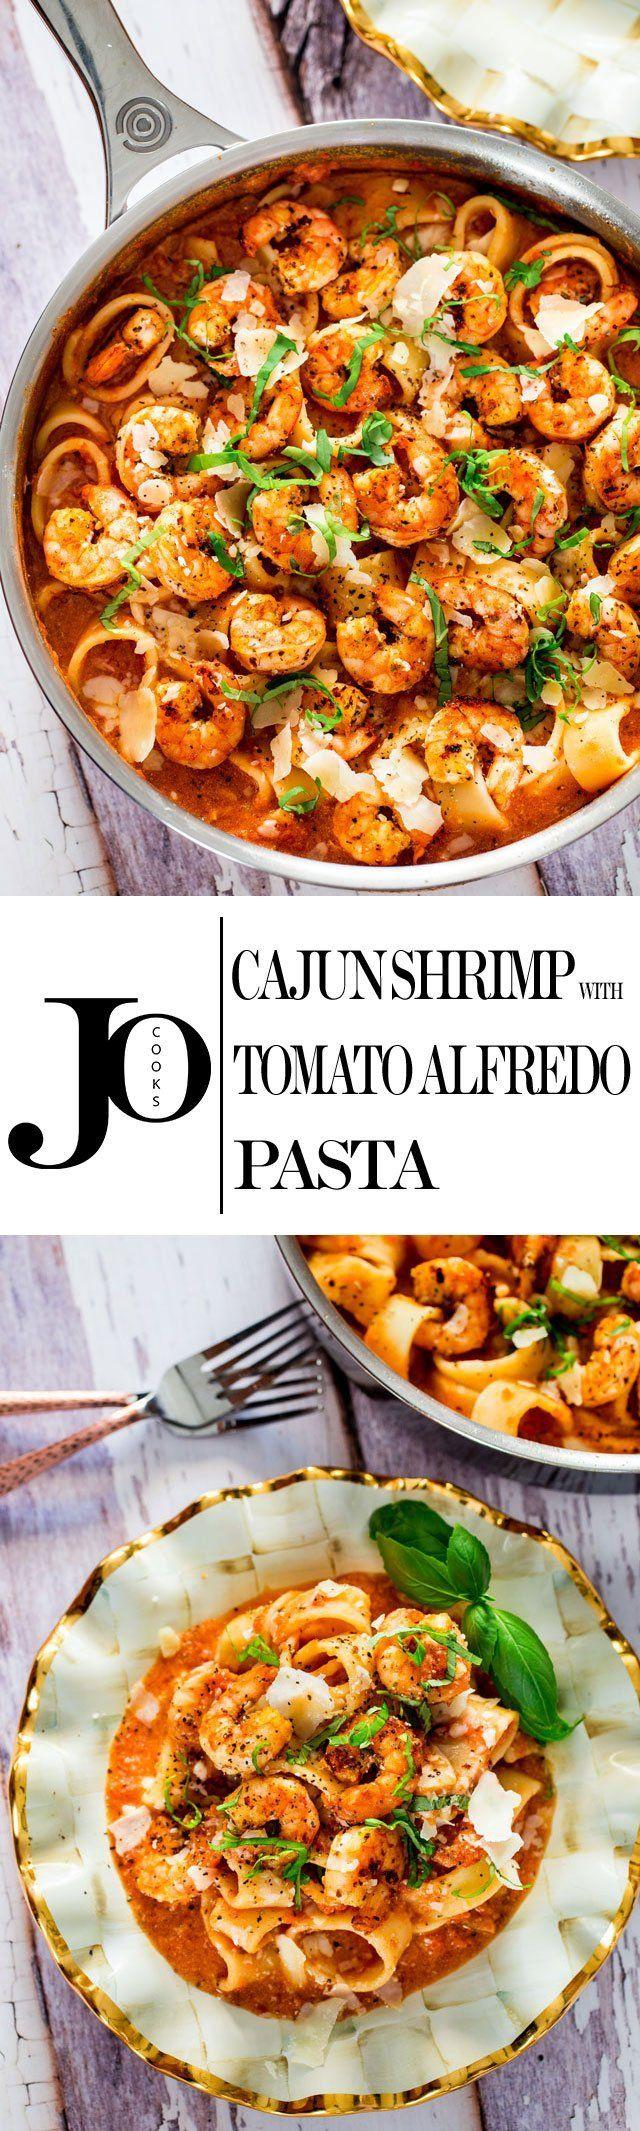 Cajun Shrimp with Tomato Alfredo Pasta @FoodBlogs